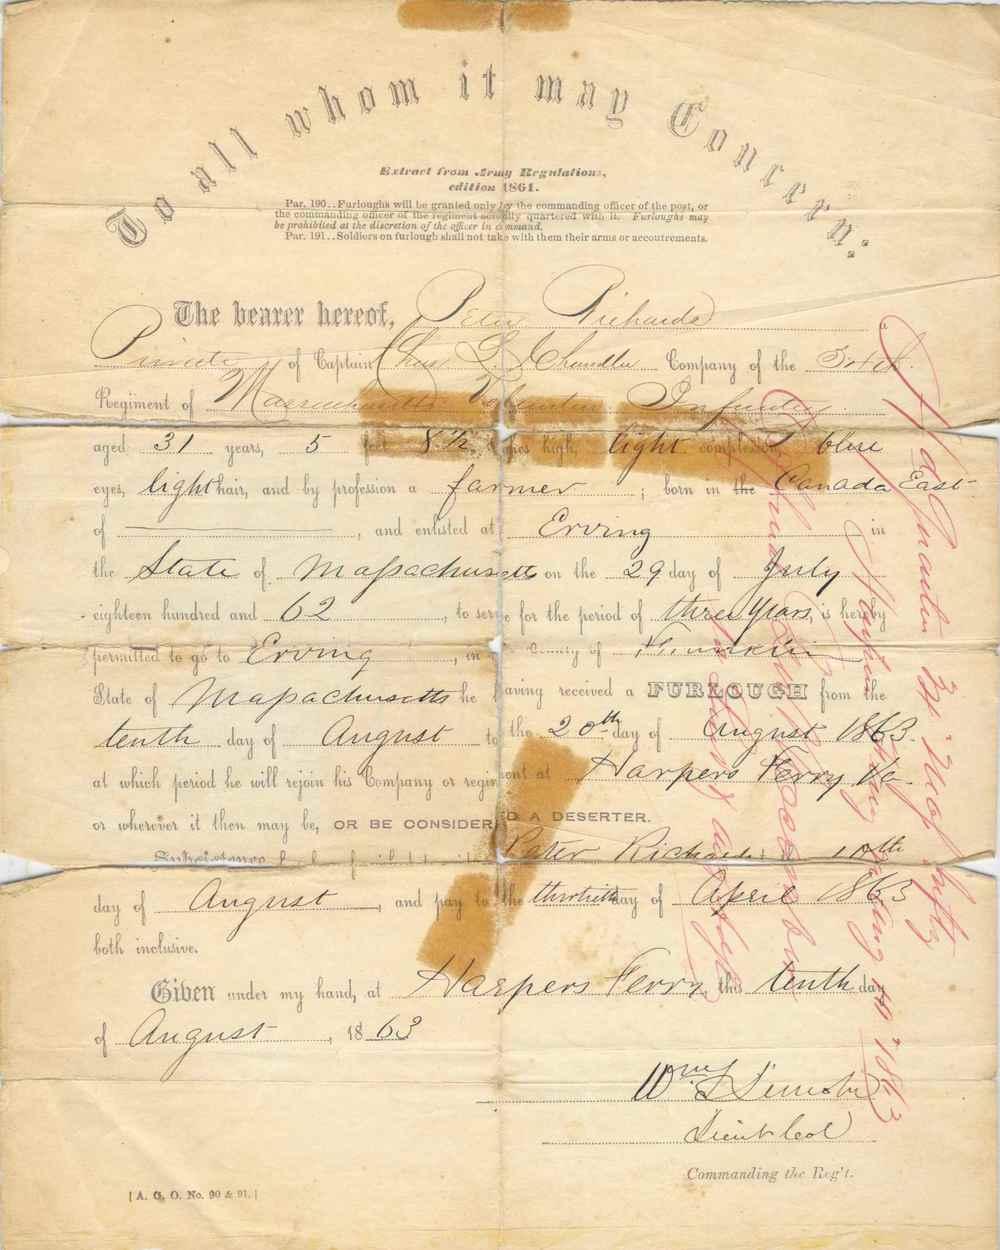 Peter Richards' August, 1863 furlough.